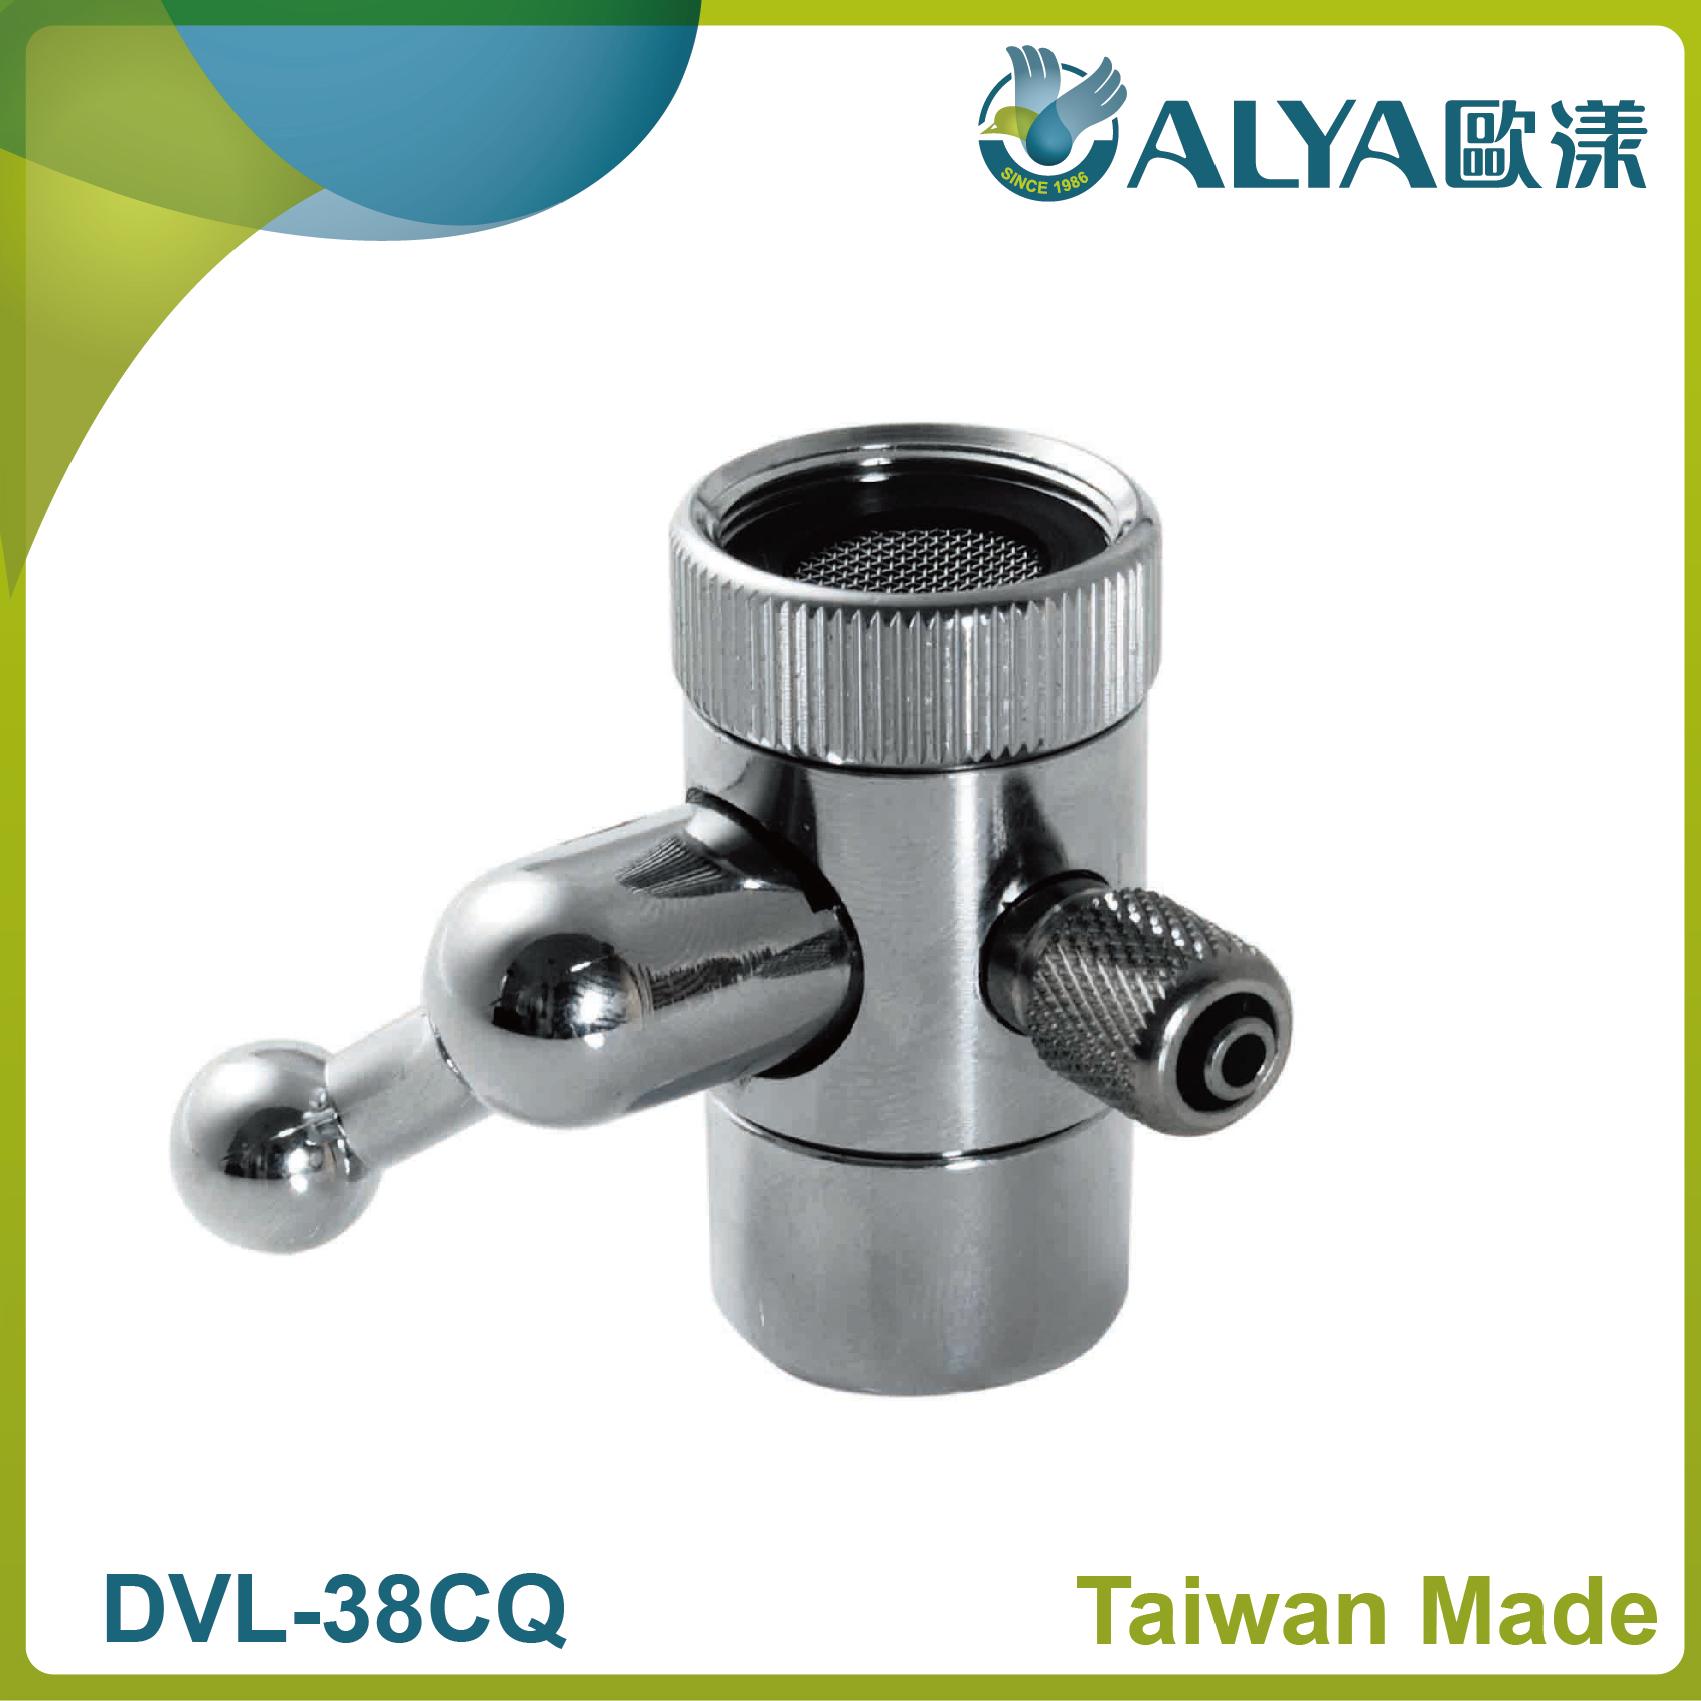 Brass diverter valve with plastic handle-DVL-38CQ